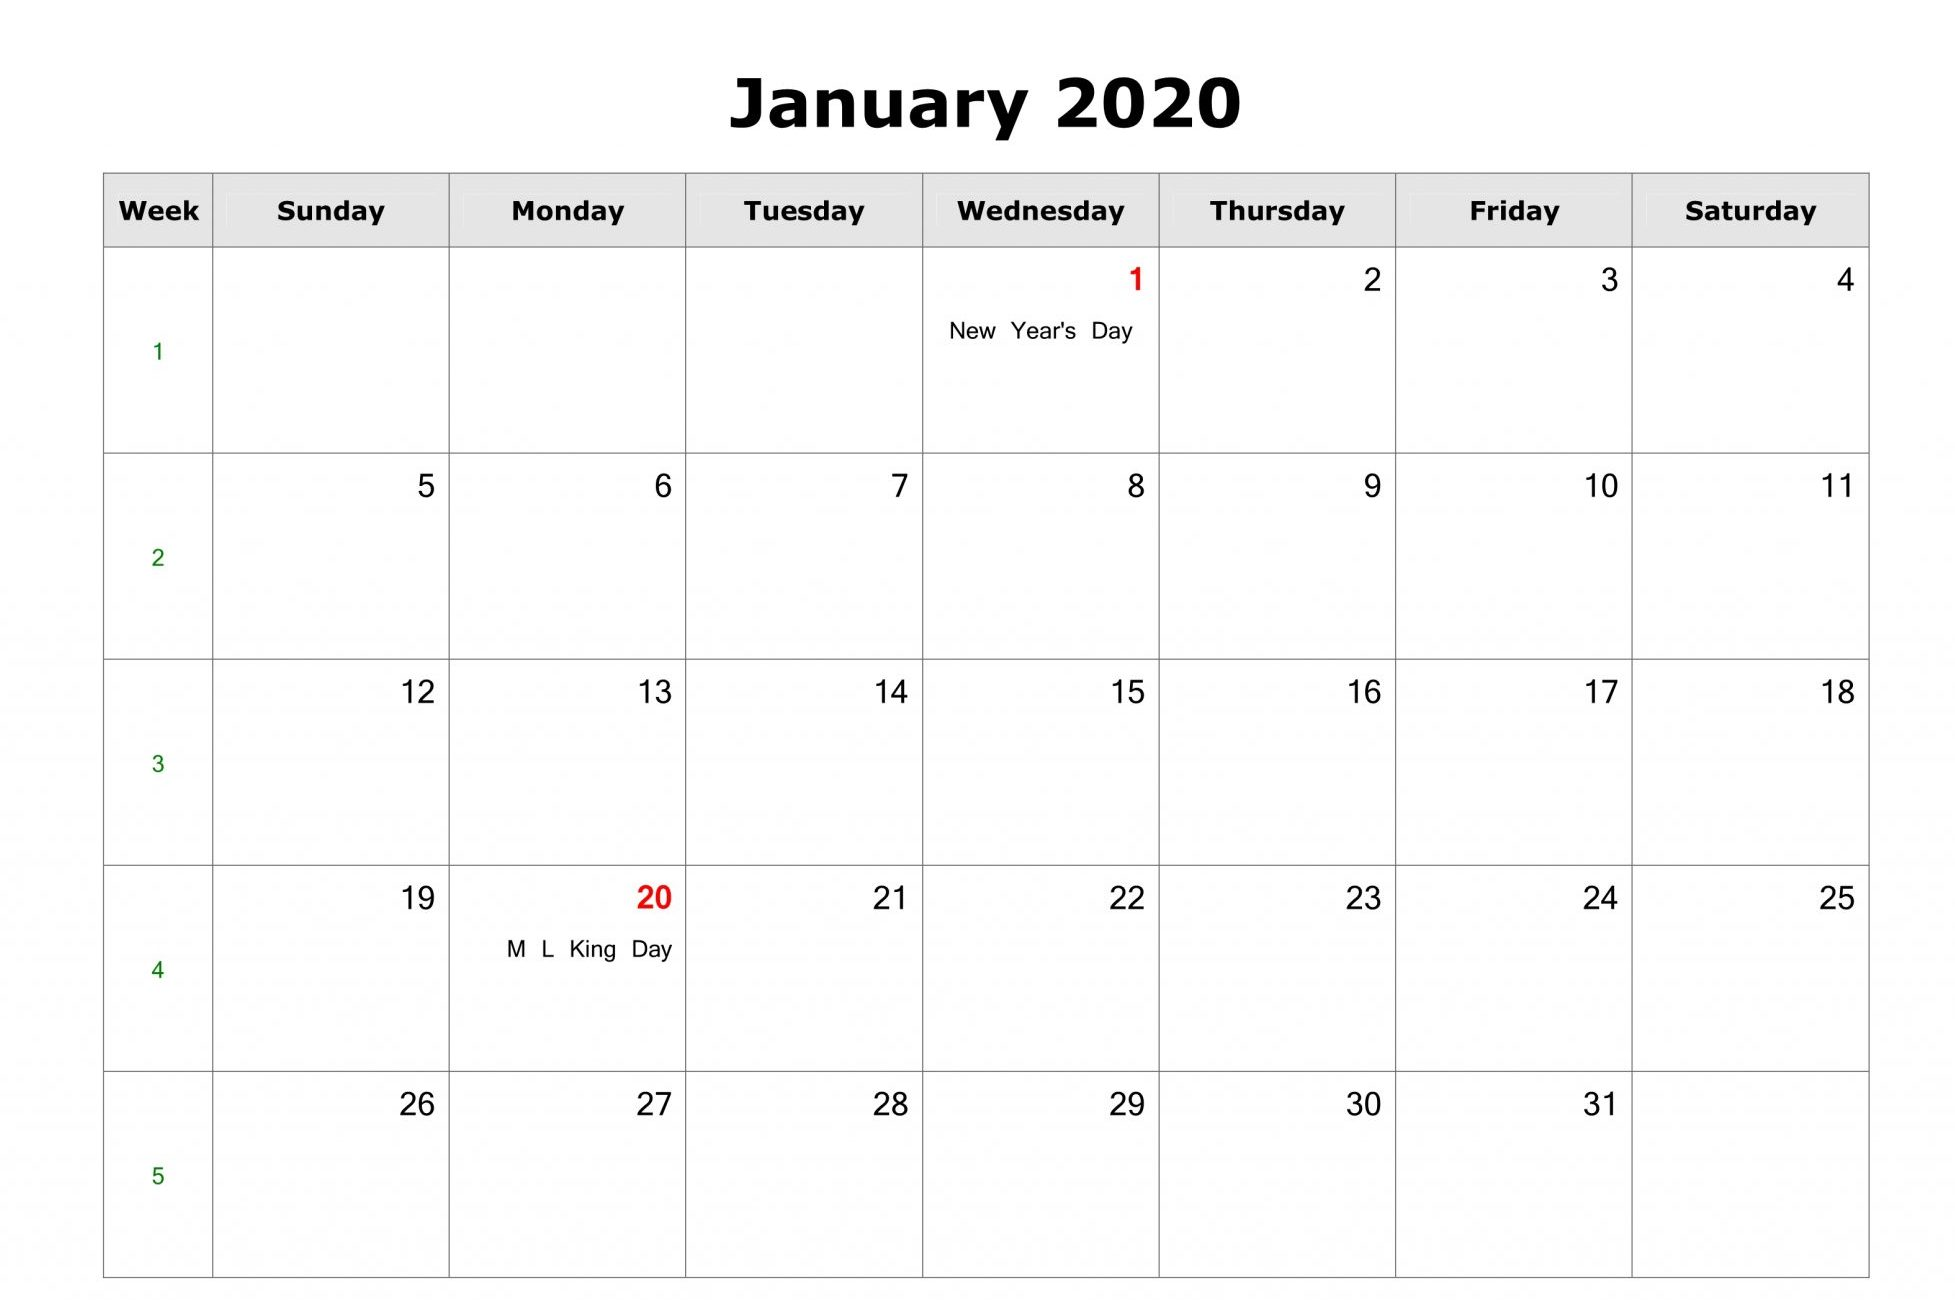 Jan 2020 Calendar with Holidays